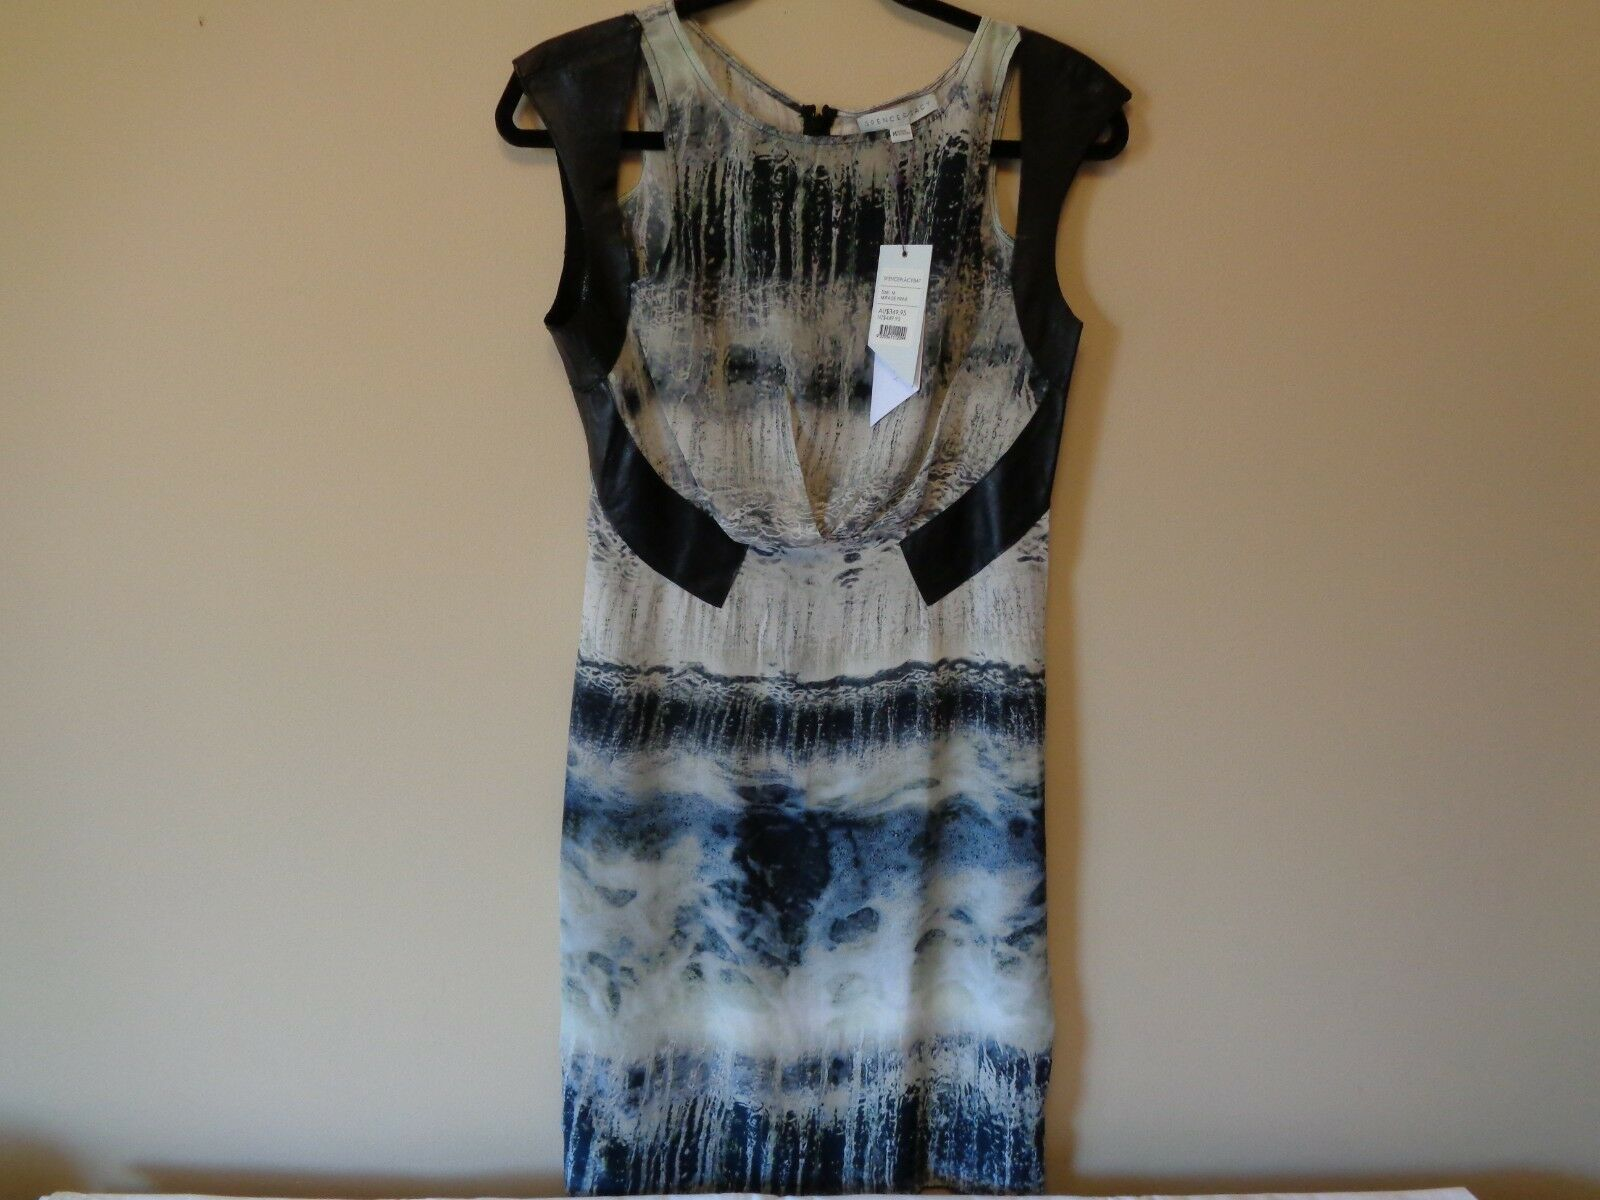 SPENCER LACY WOMEN'S MIRAGE DRESS SIZE MEDIUM BRAND NEW